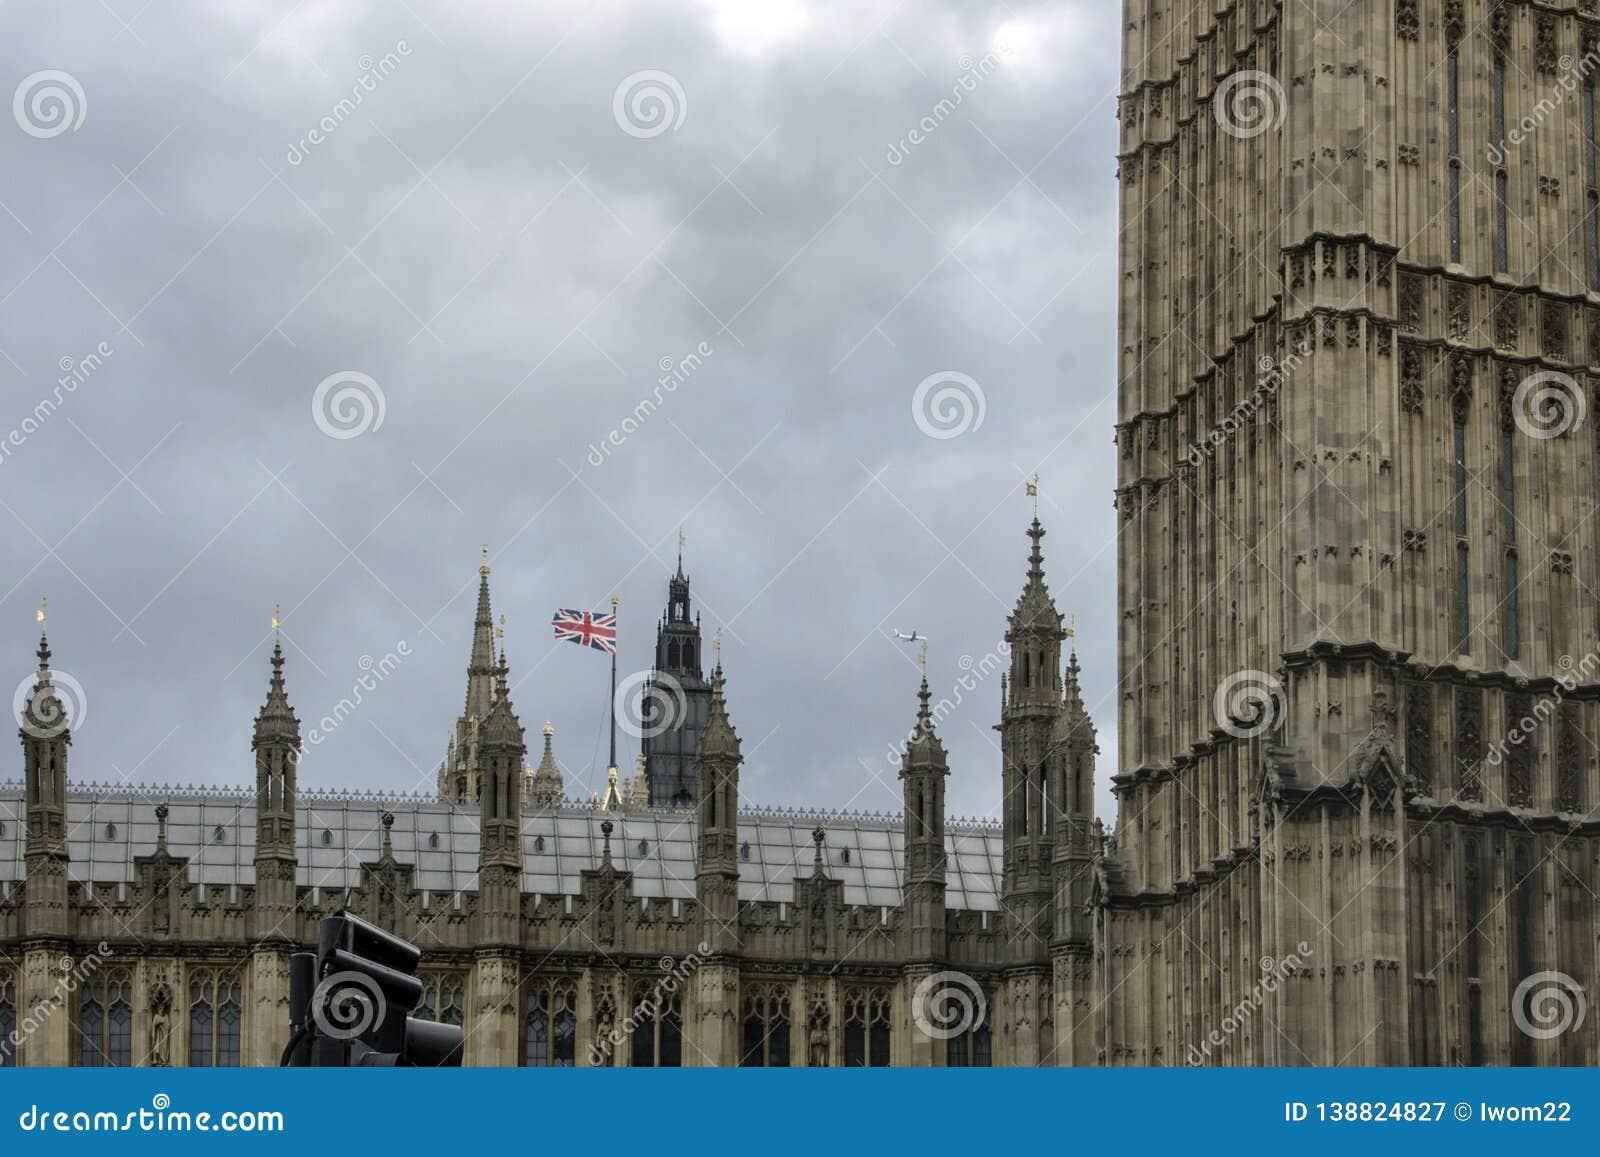 The Palace of Westminster. London, England, UK.